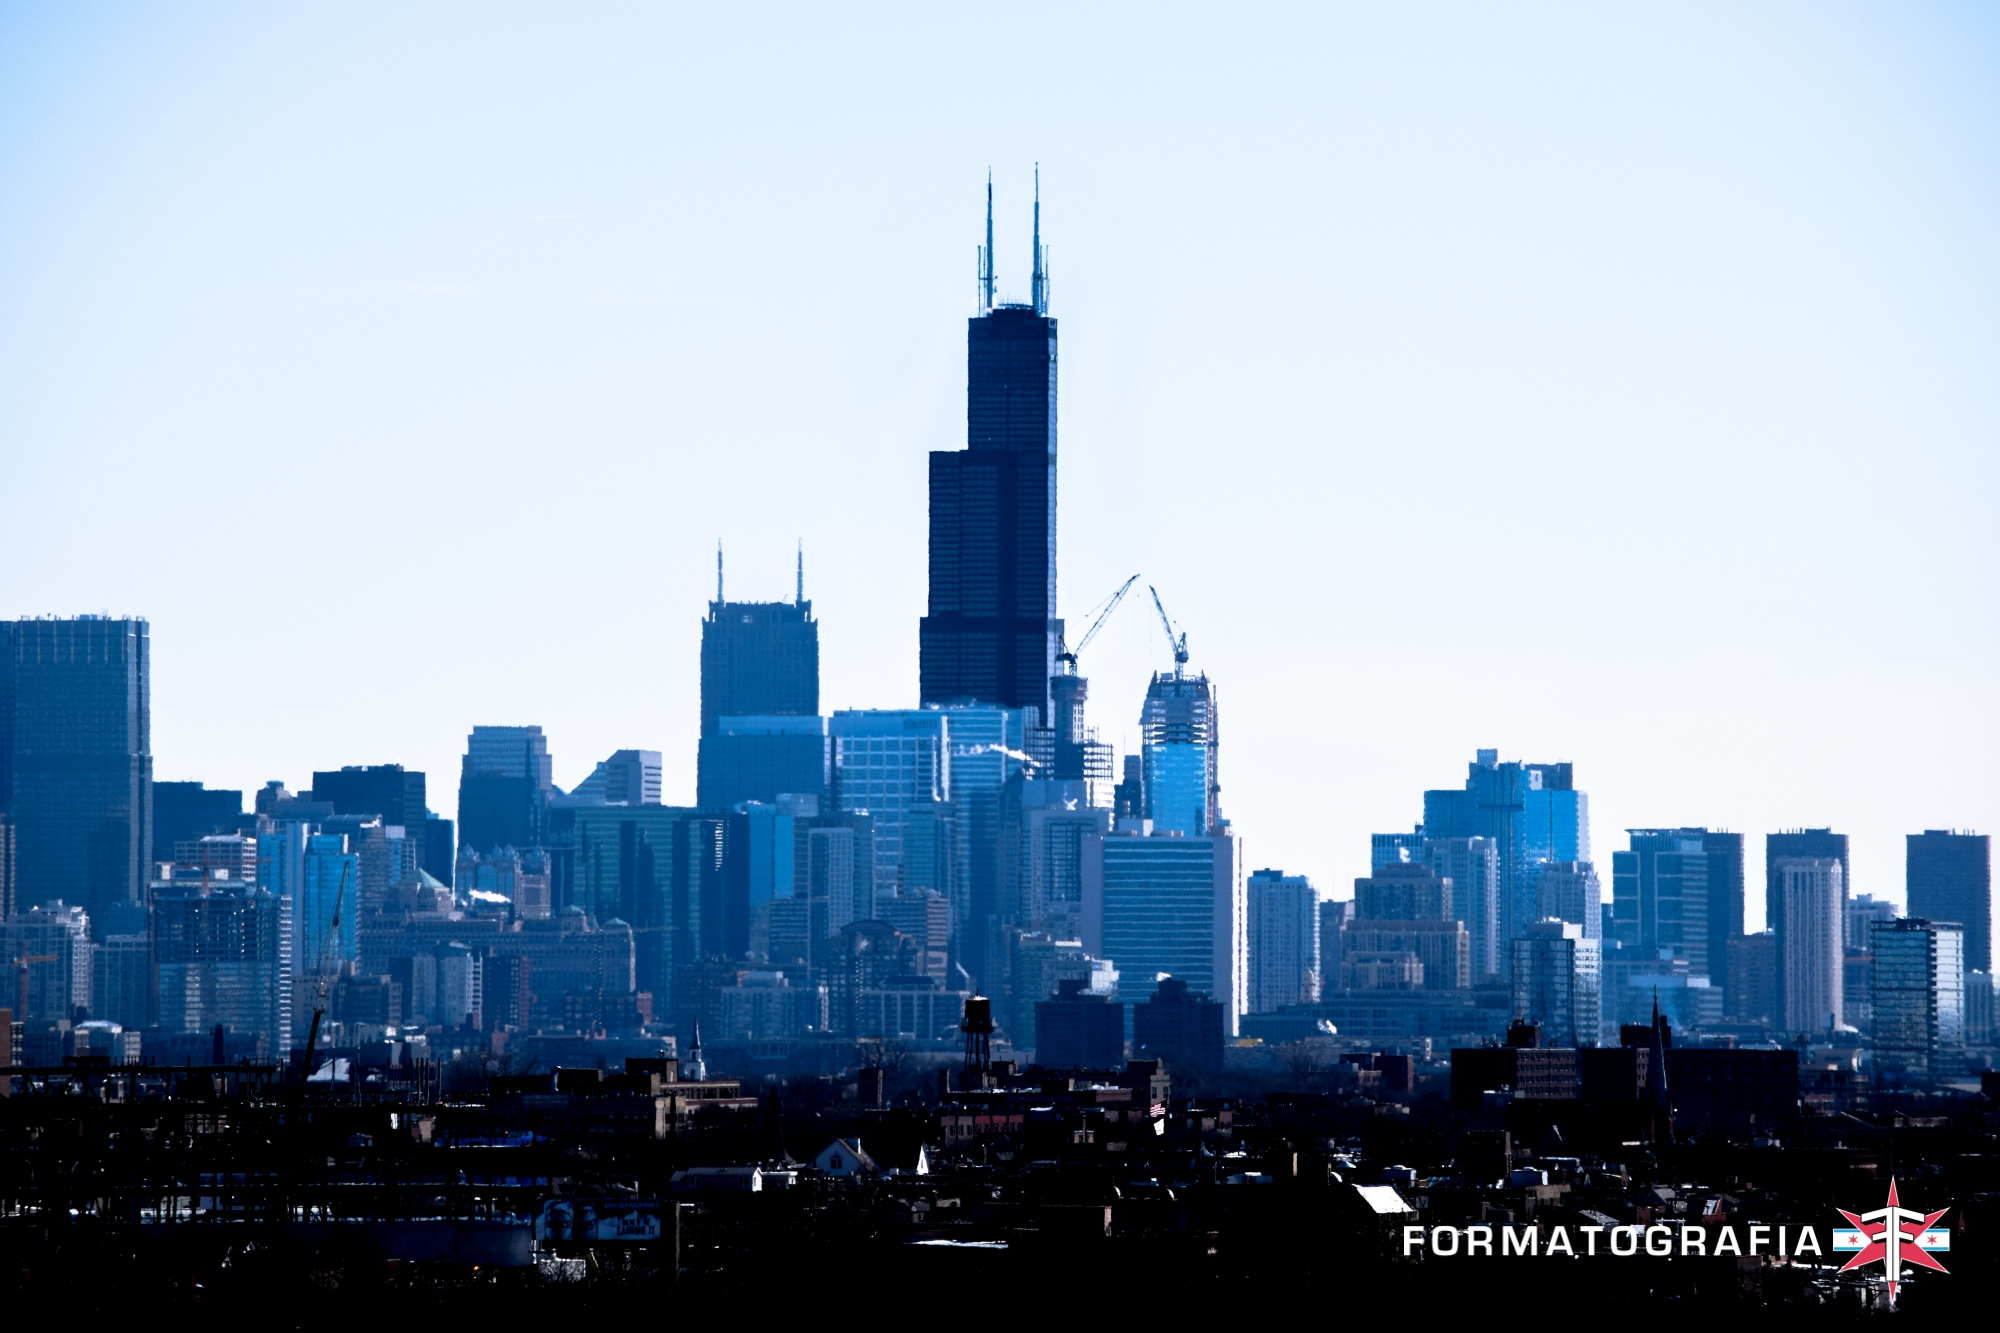 eric formato chicago photographer fall update city architecture shots20160302-DSC_0637.jpg